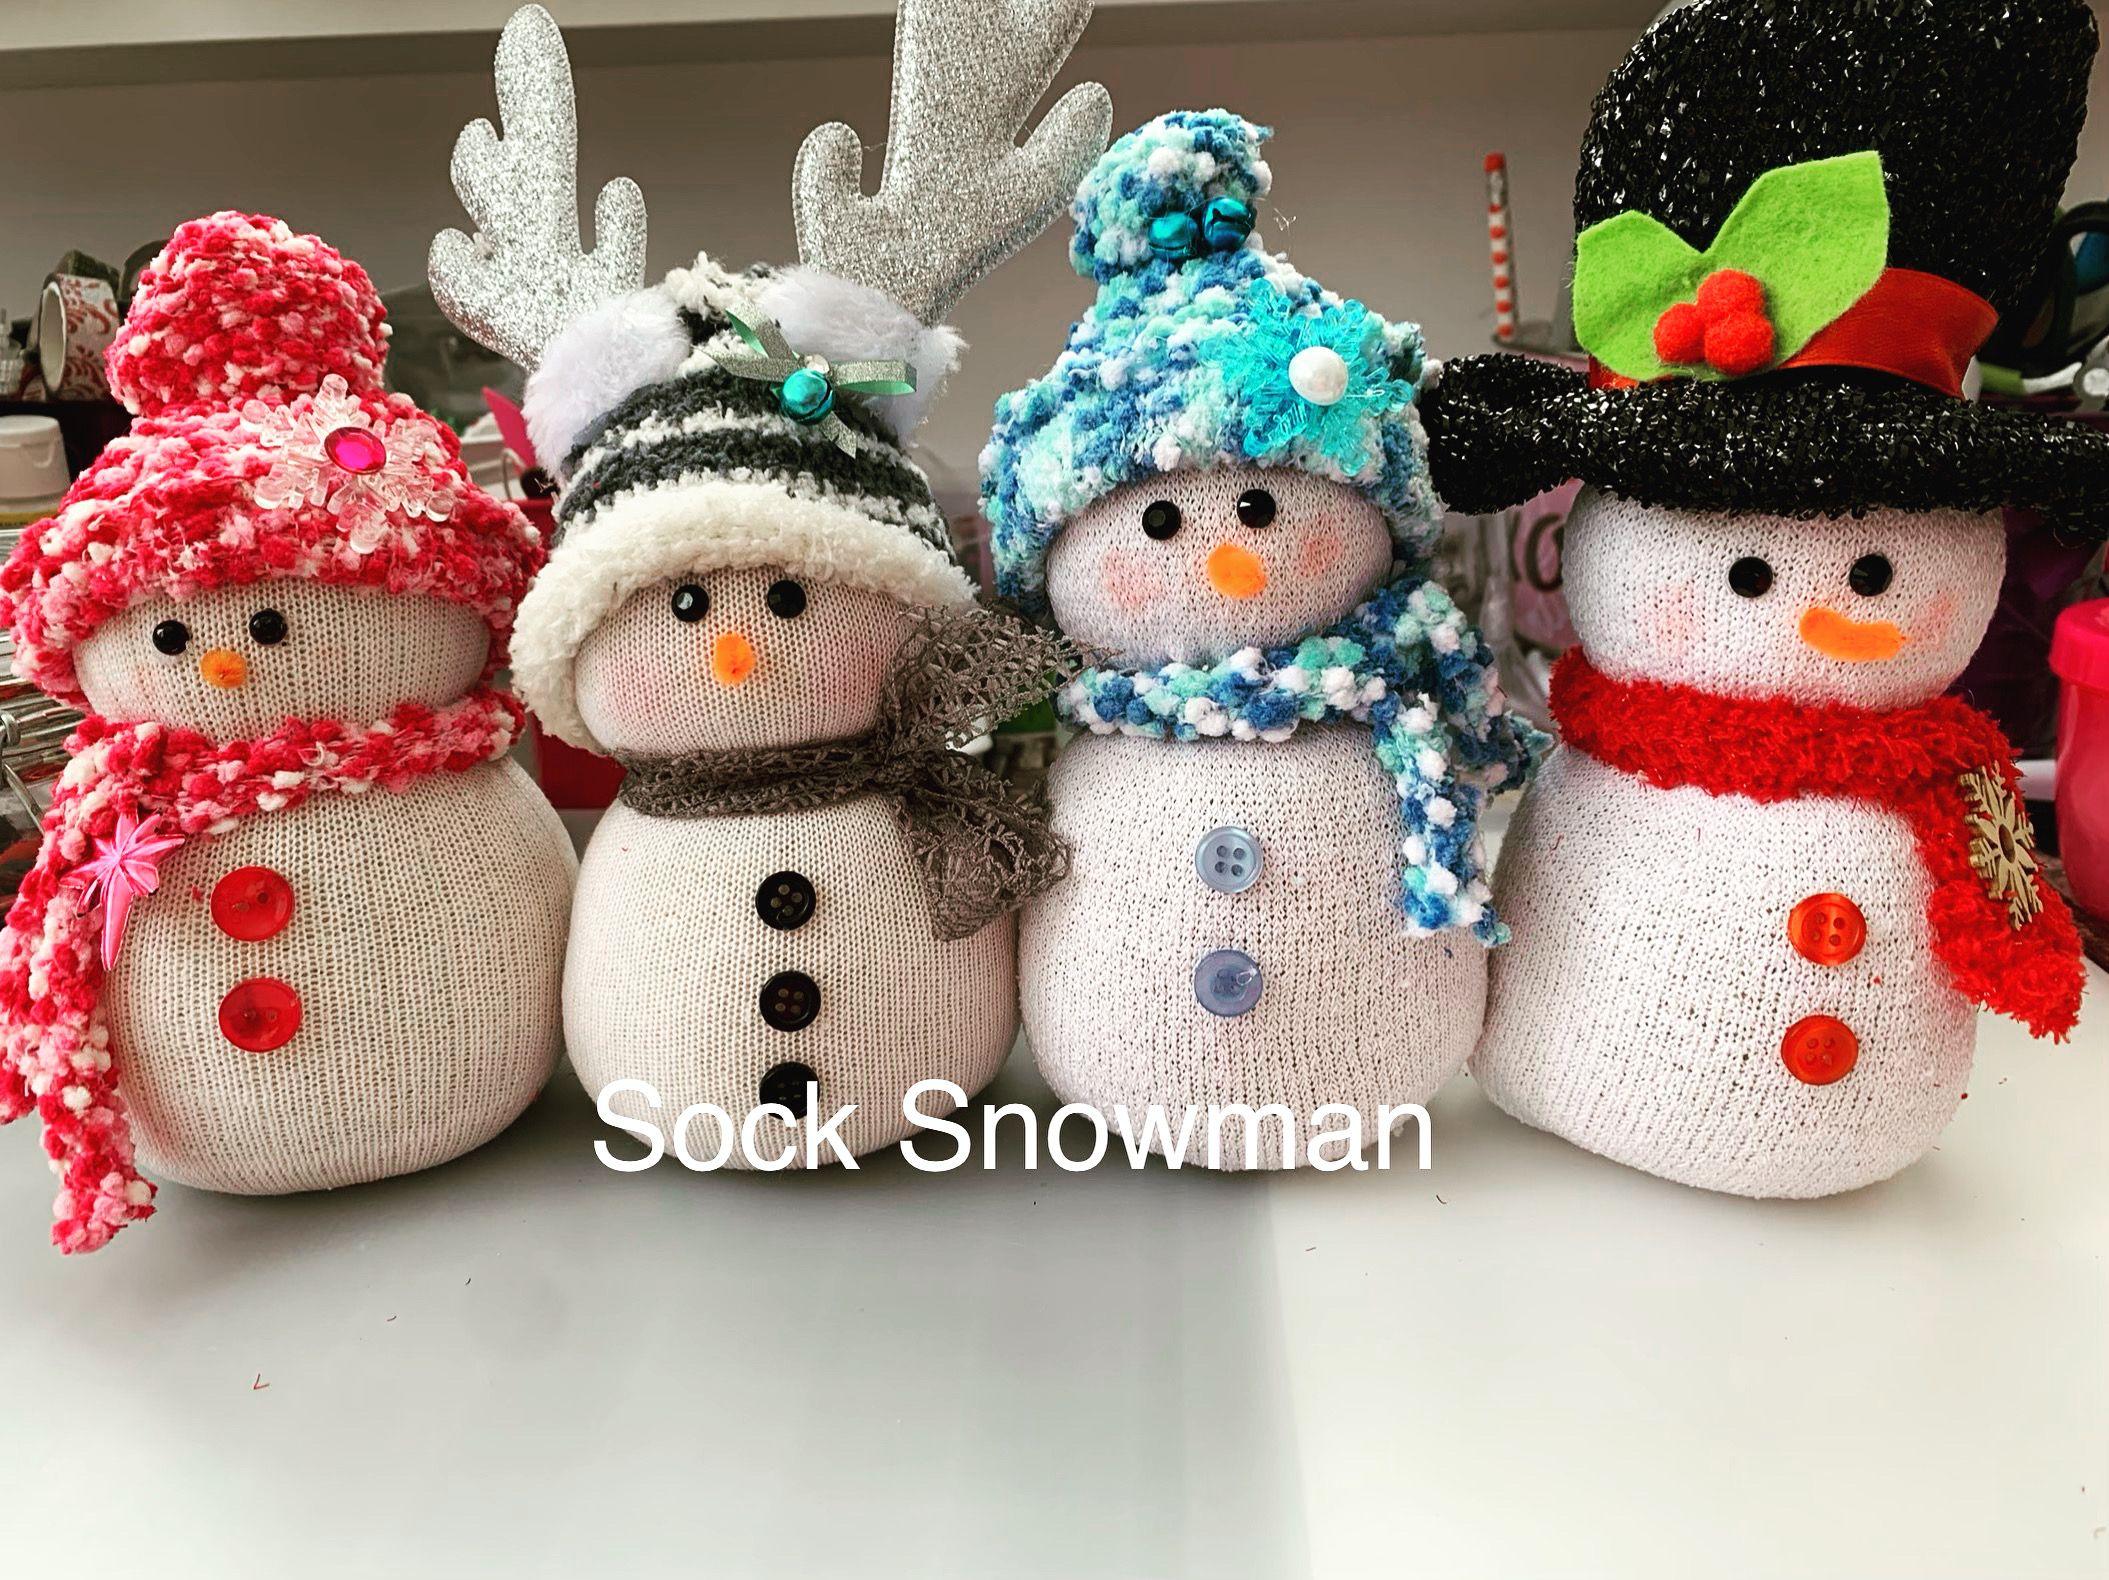 Diy Sock Snowman Diy Snowman Decorations Diy Snowman Ornaments Sock Snowman Craft